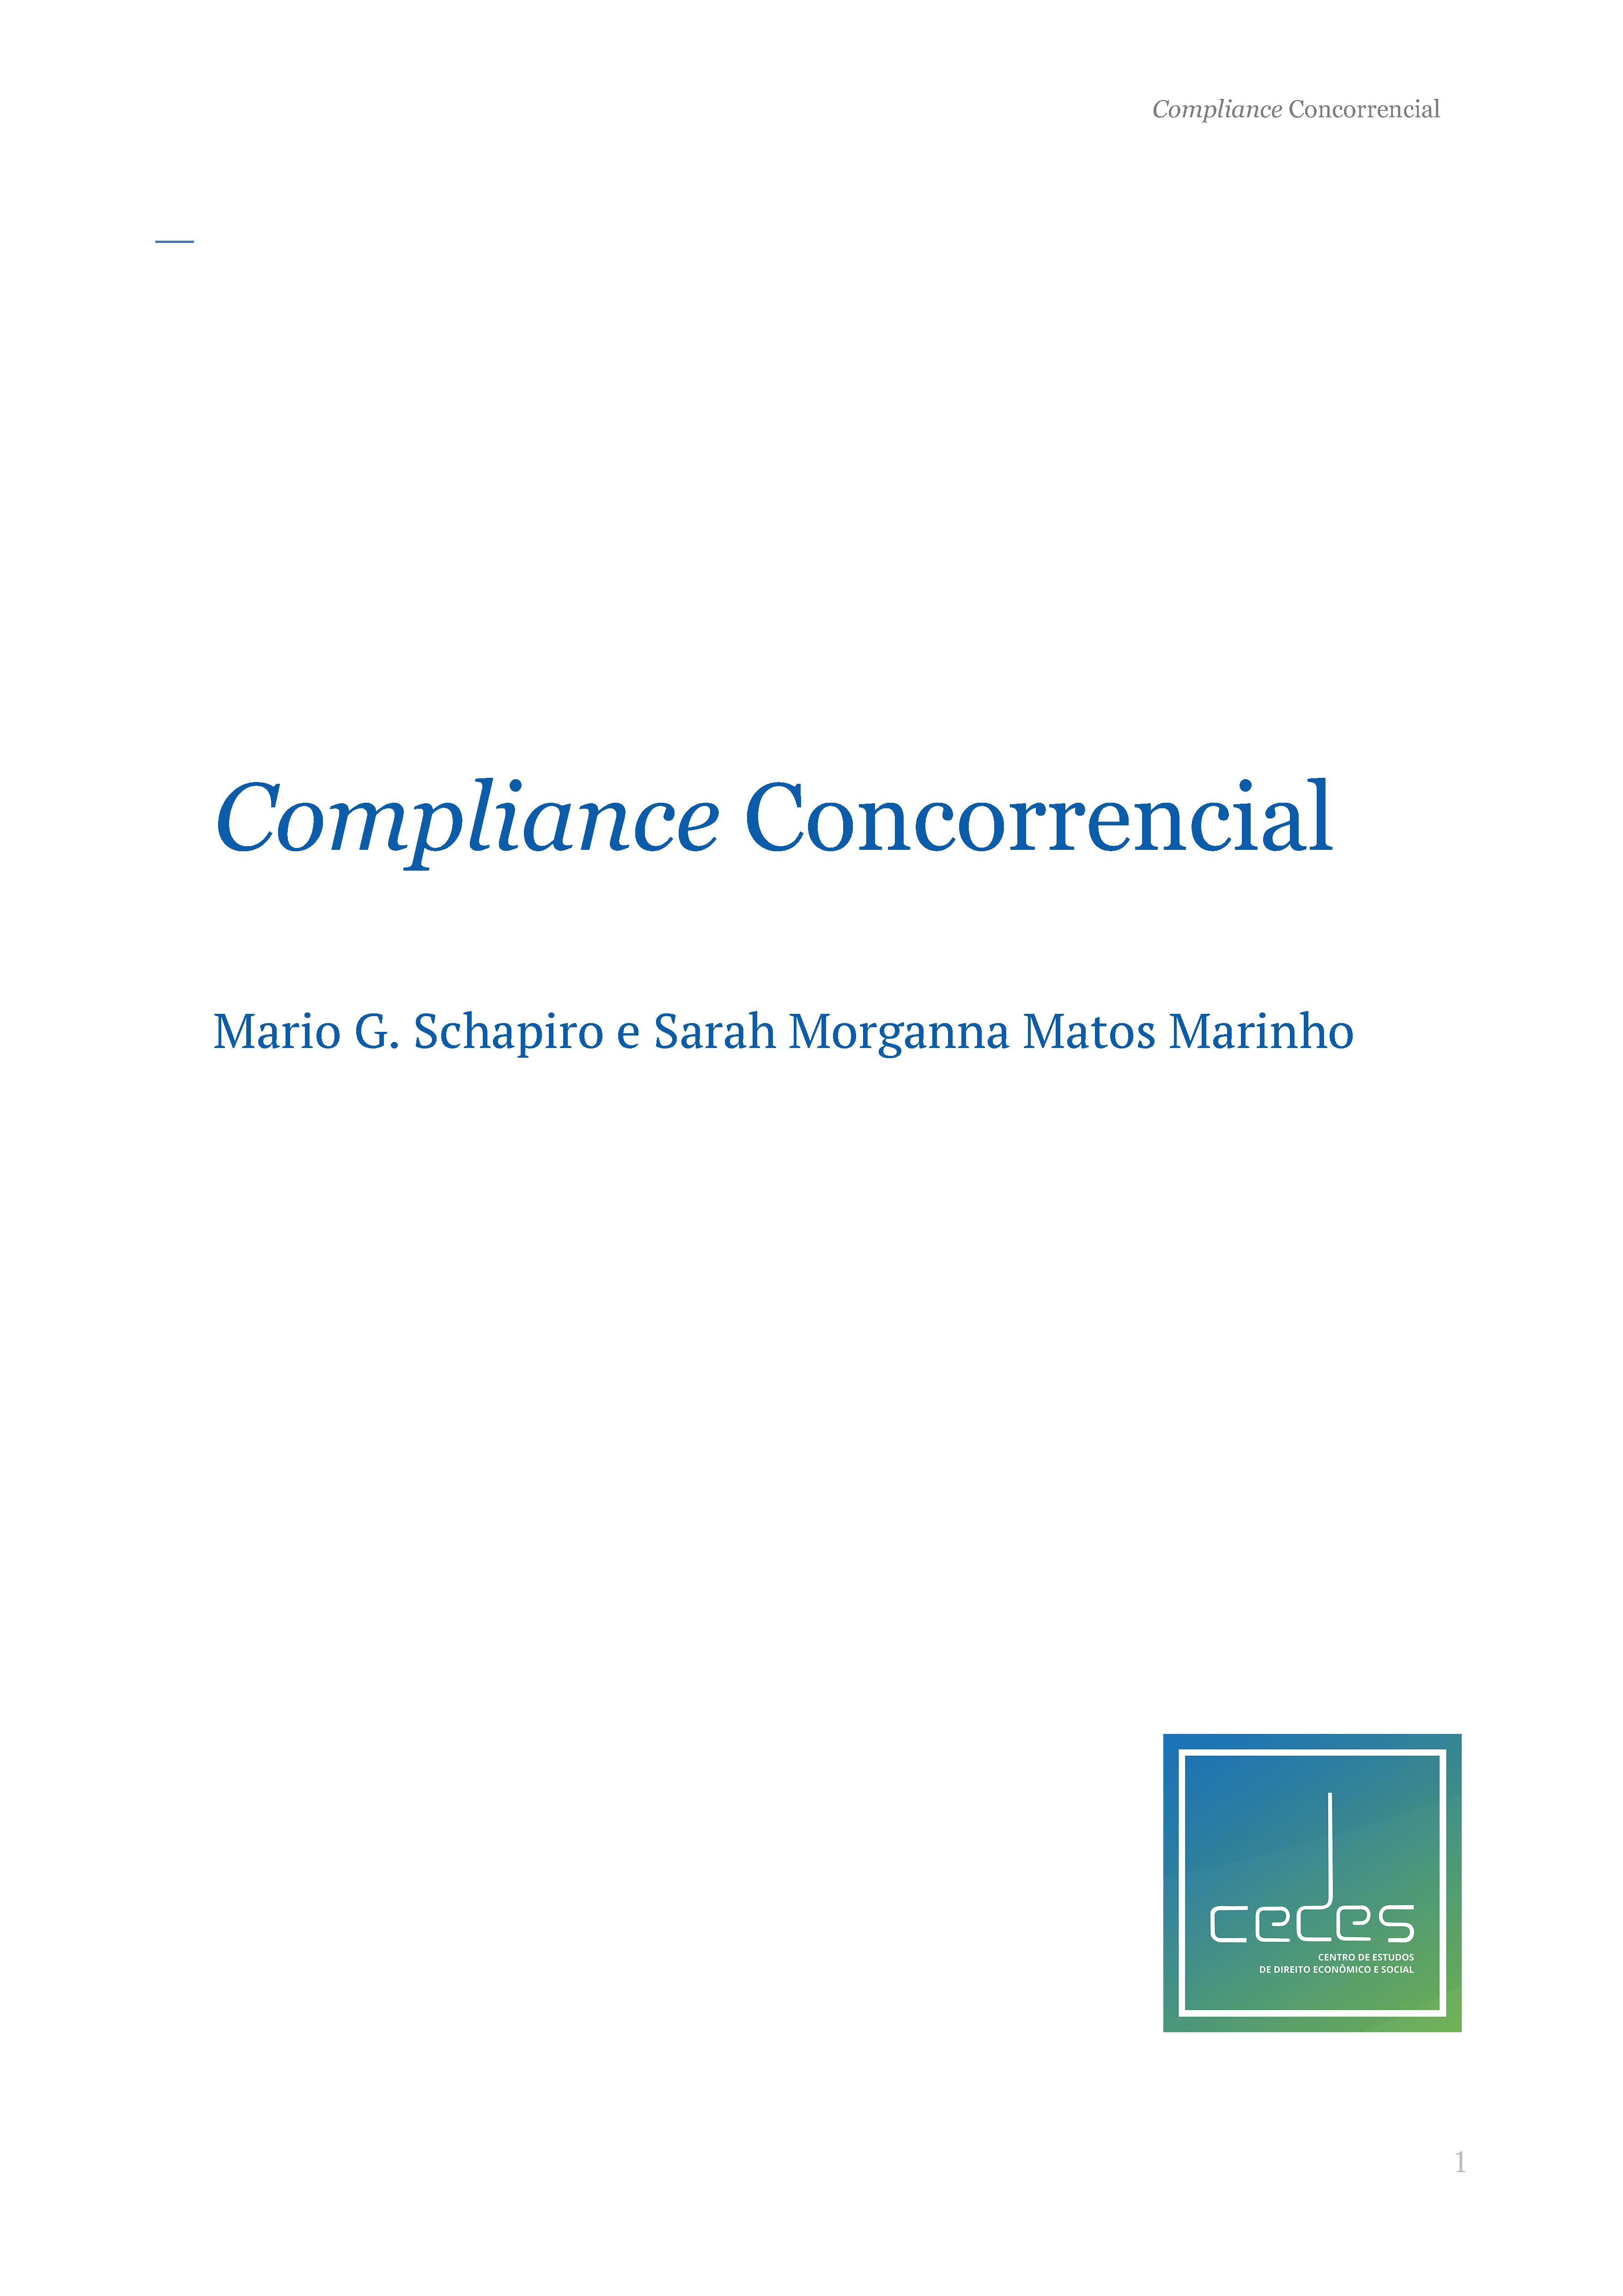 Pesquisa compliance